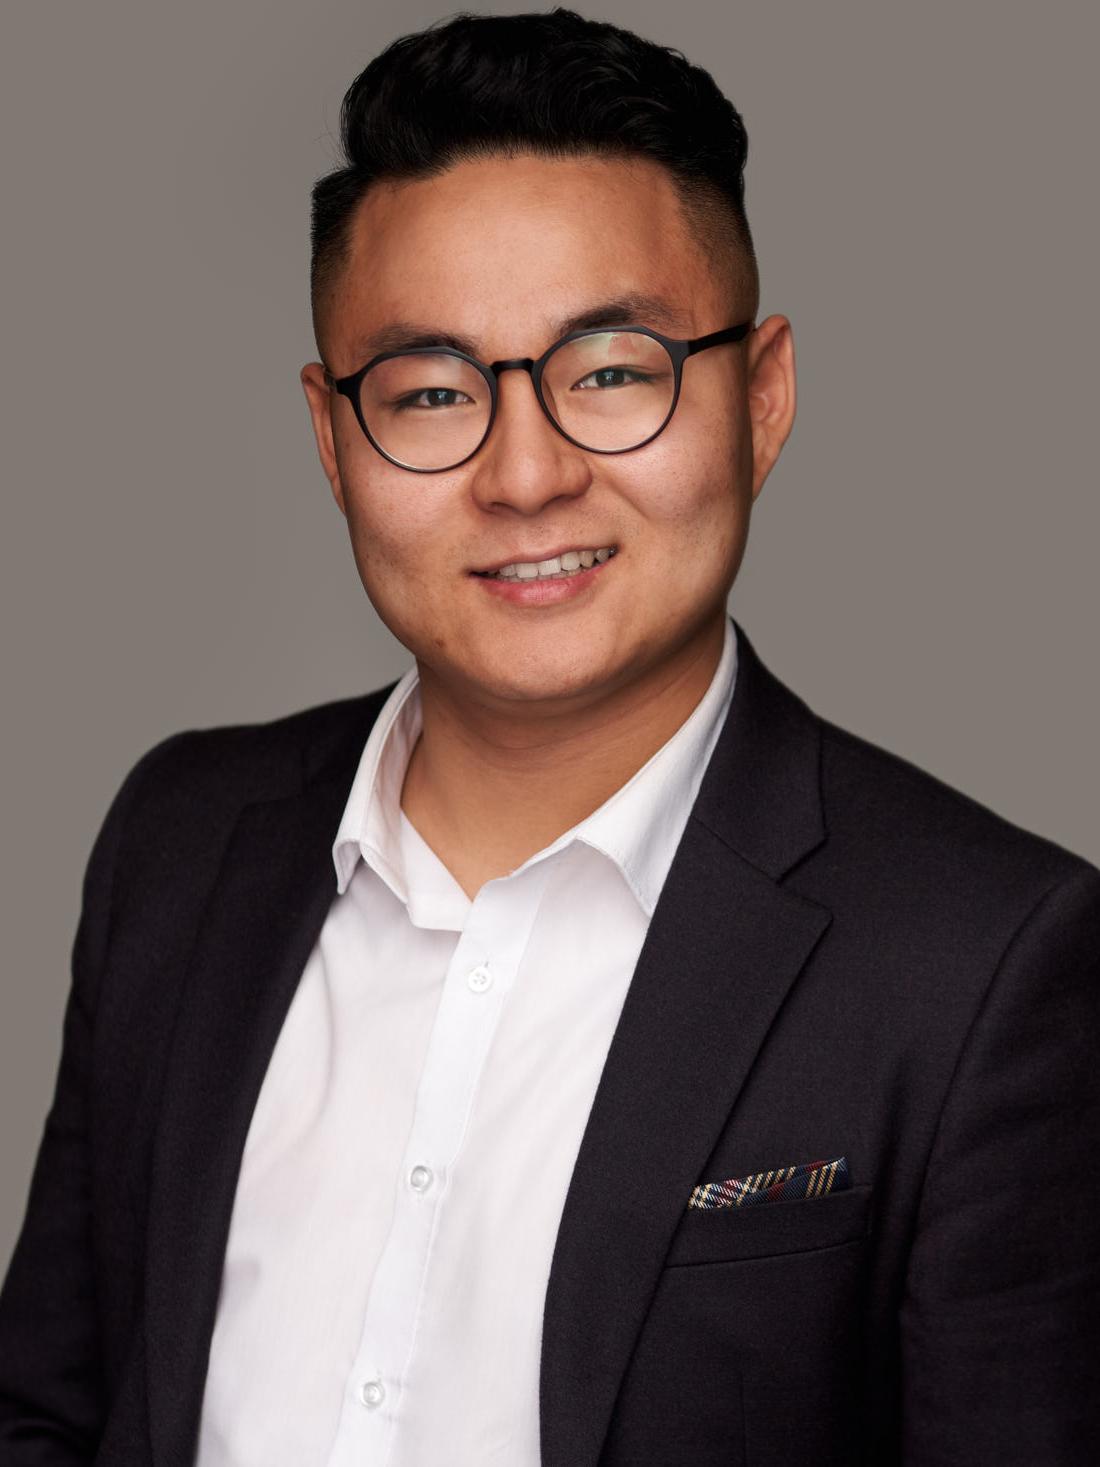 Han Dol Kim | 김한돌 | 金汉东 Real Estate Agent